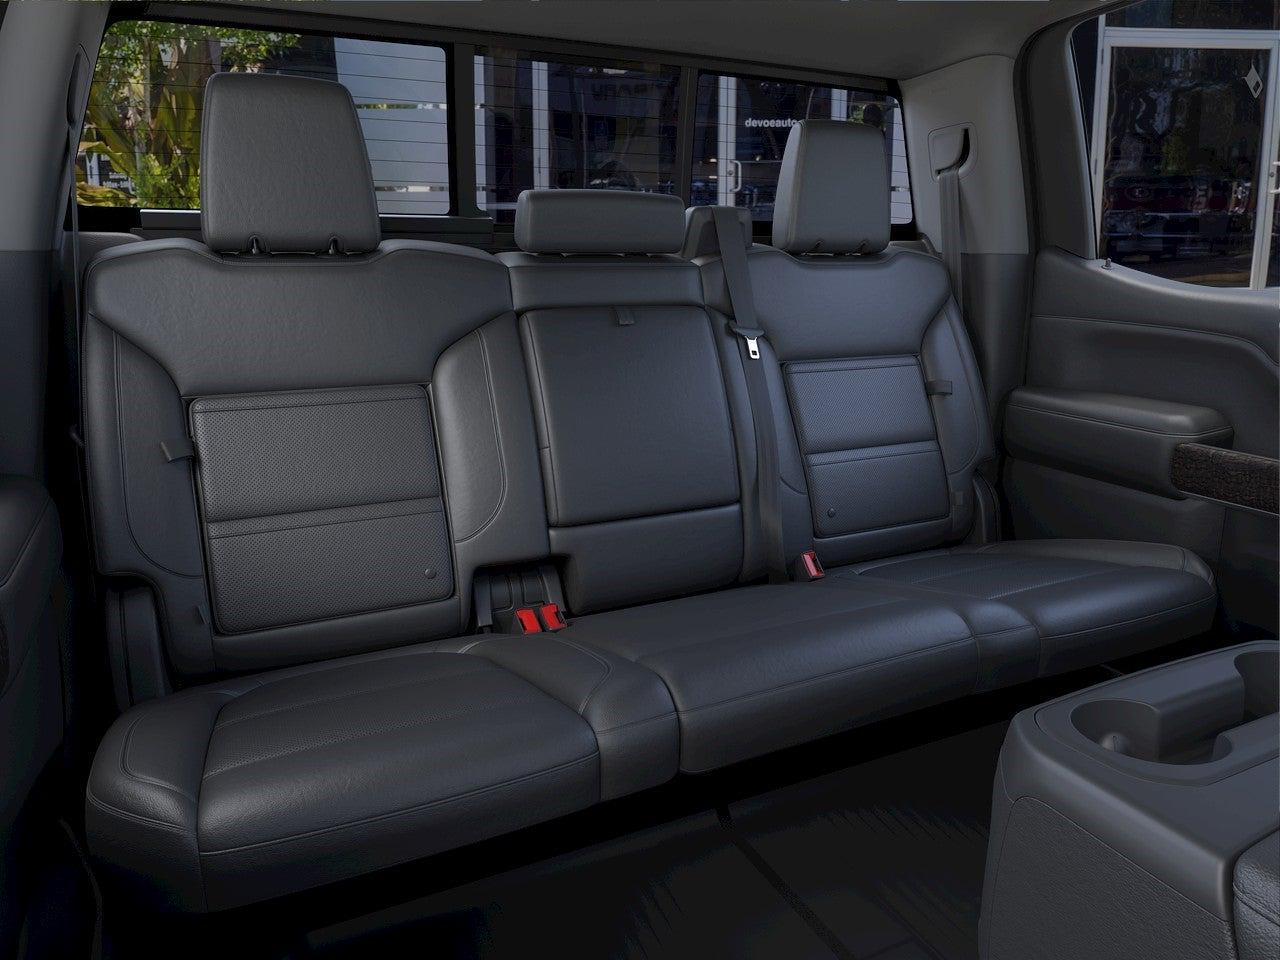 2021 GMC Sierra 1500 Crew Cab 4x4, Pickup #T21383 - photo 34